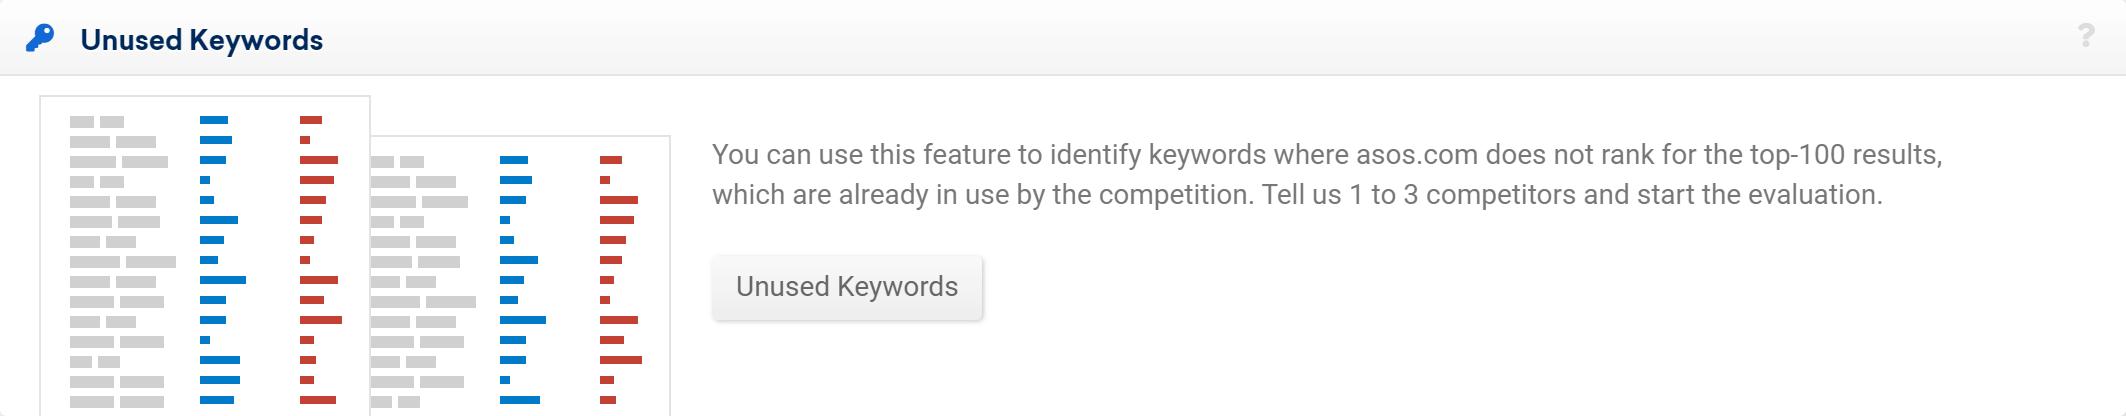 Feature Unused Keywords in the SISTRIX Toolbox